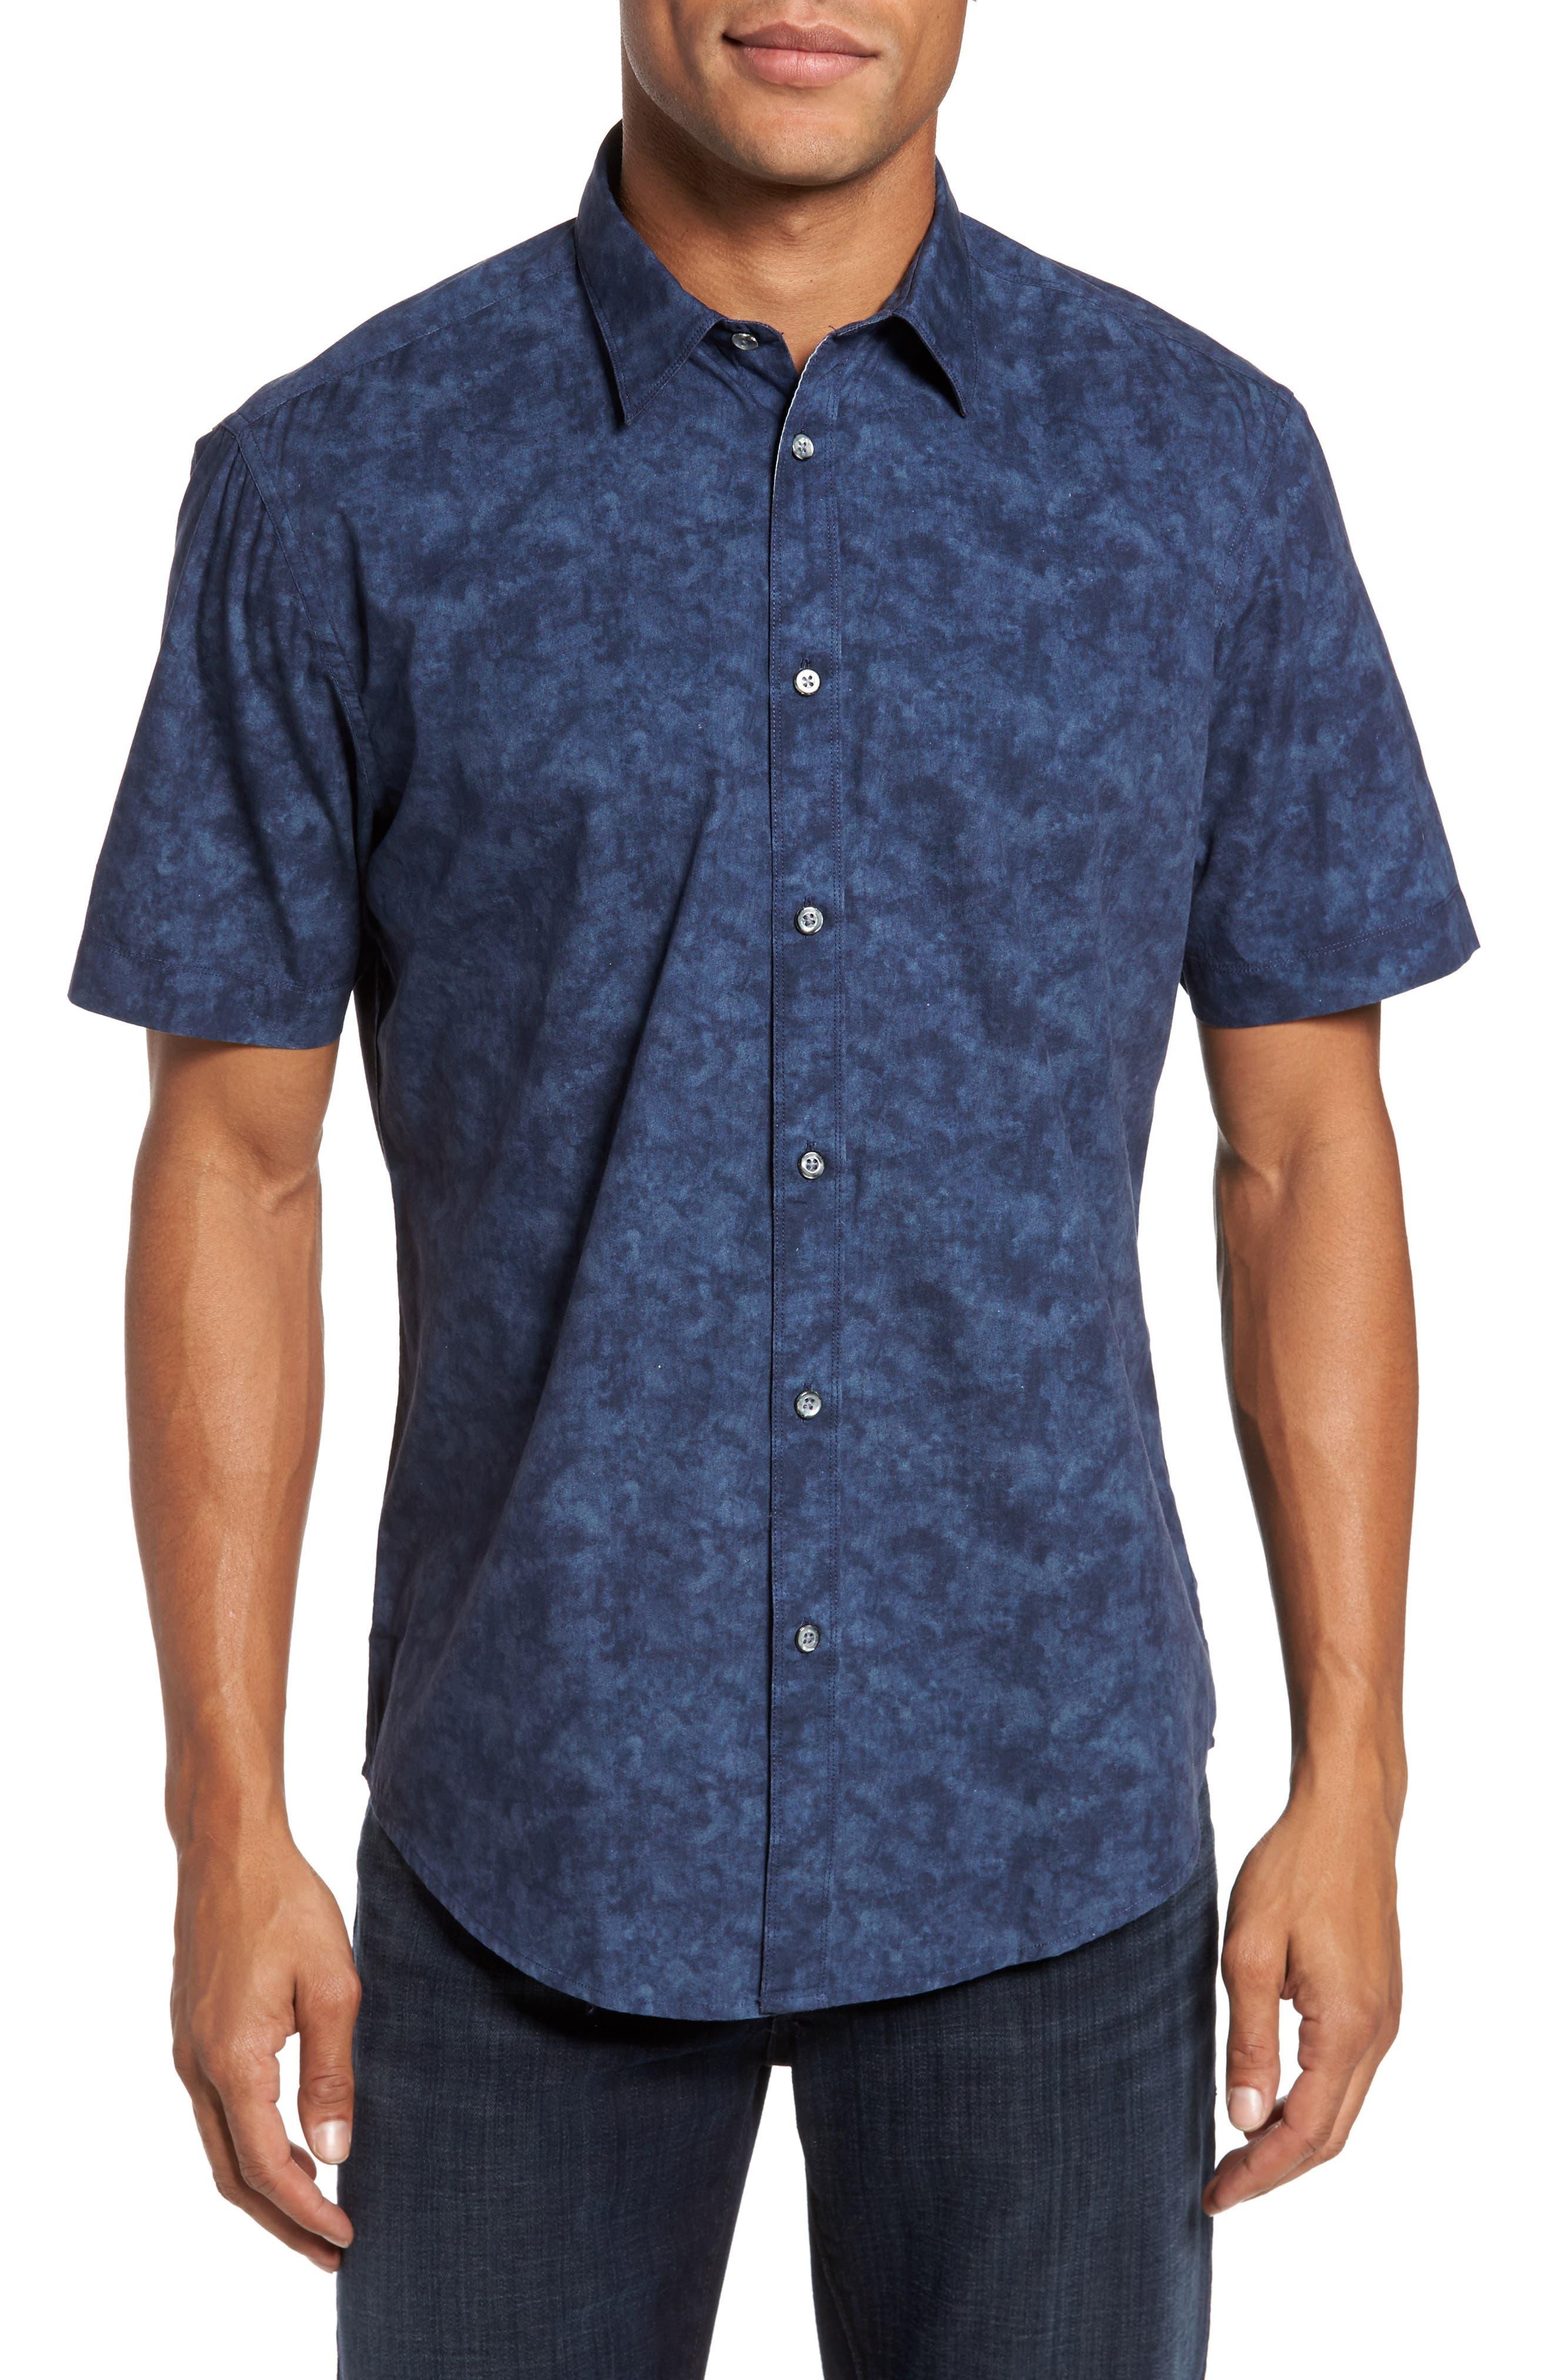 Coastaoro Seaside Regular Fit Print Sport Shirt